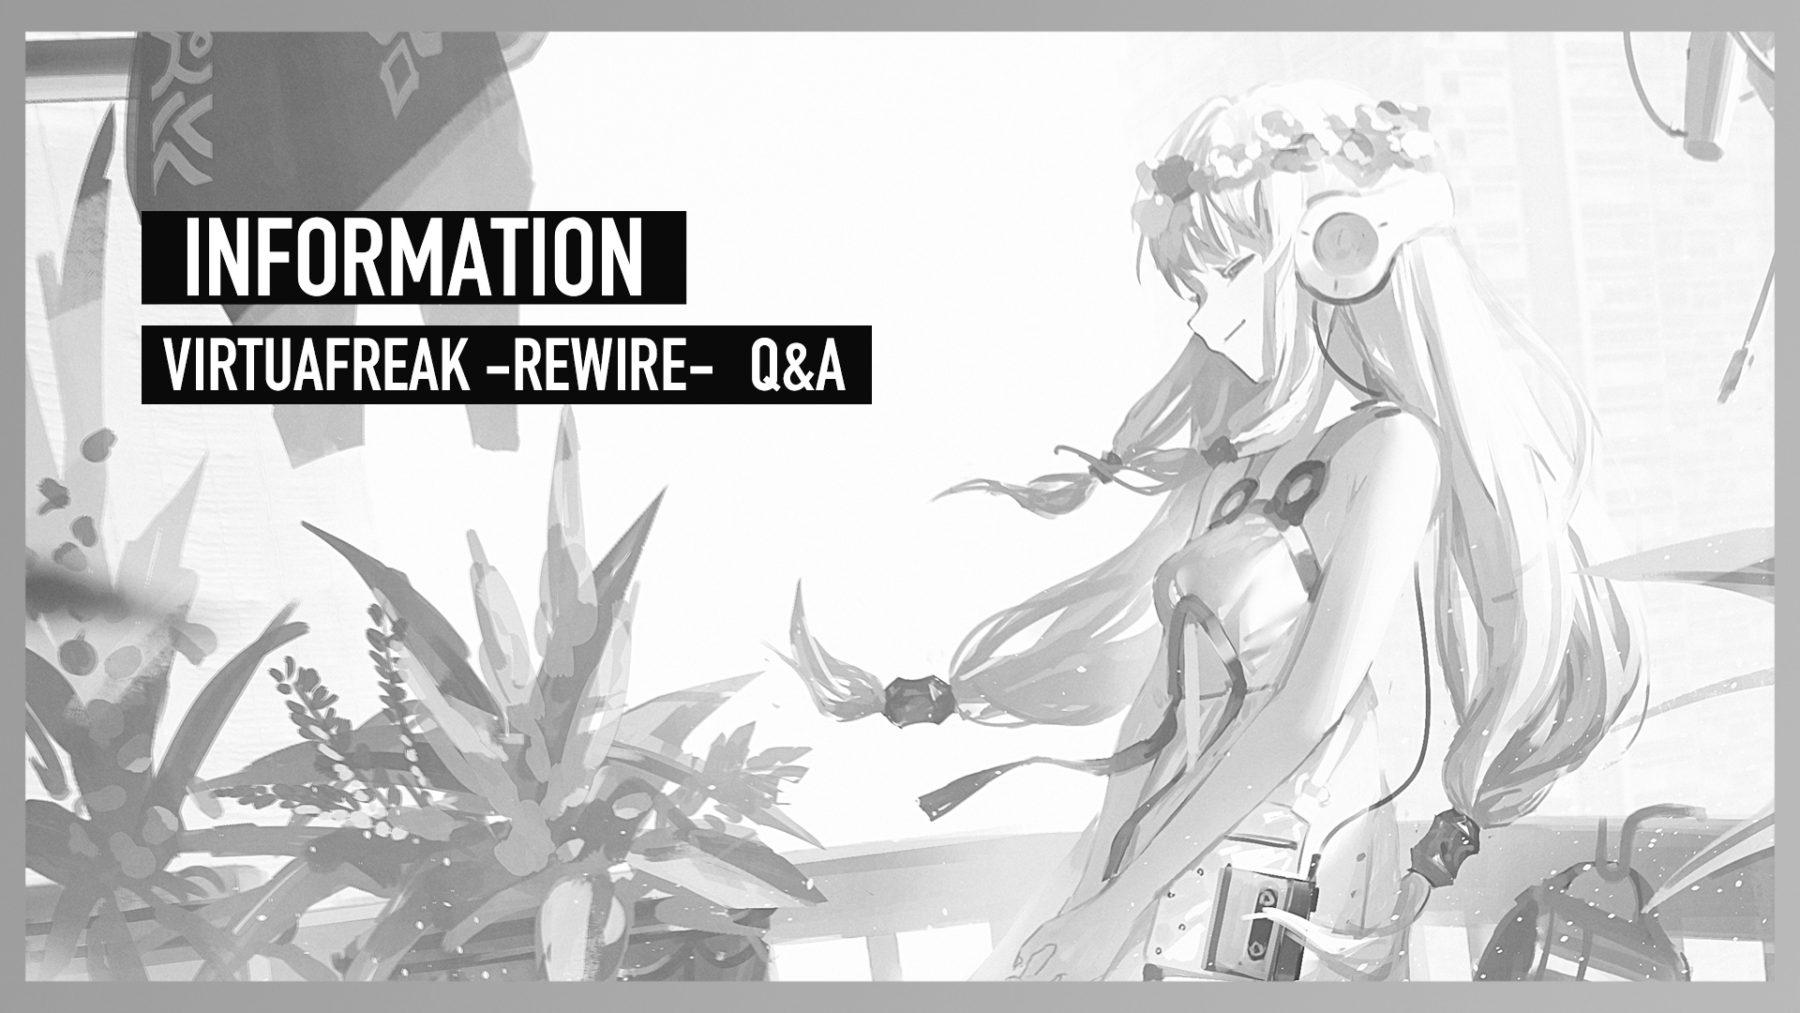 VIRTUAFREAK -REWIRE- Q&A